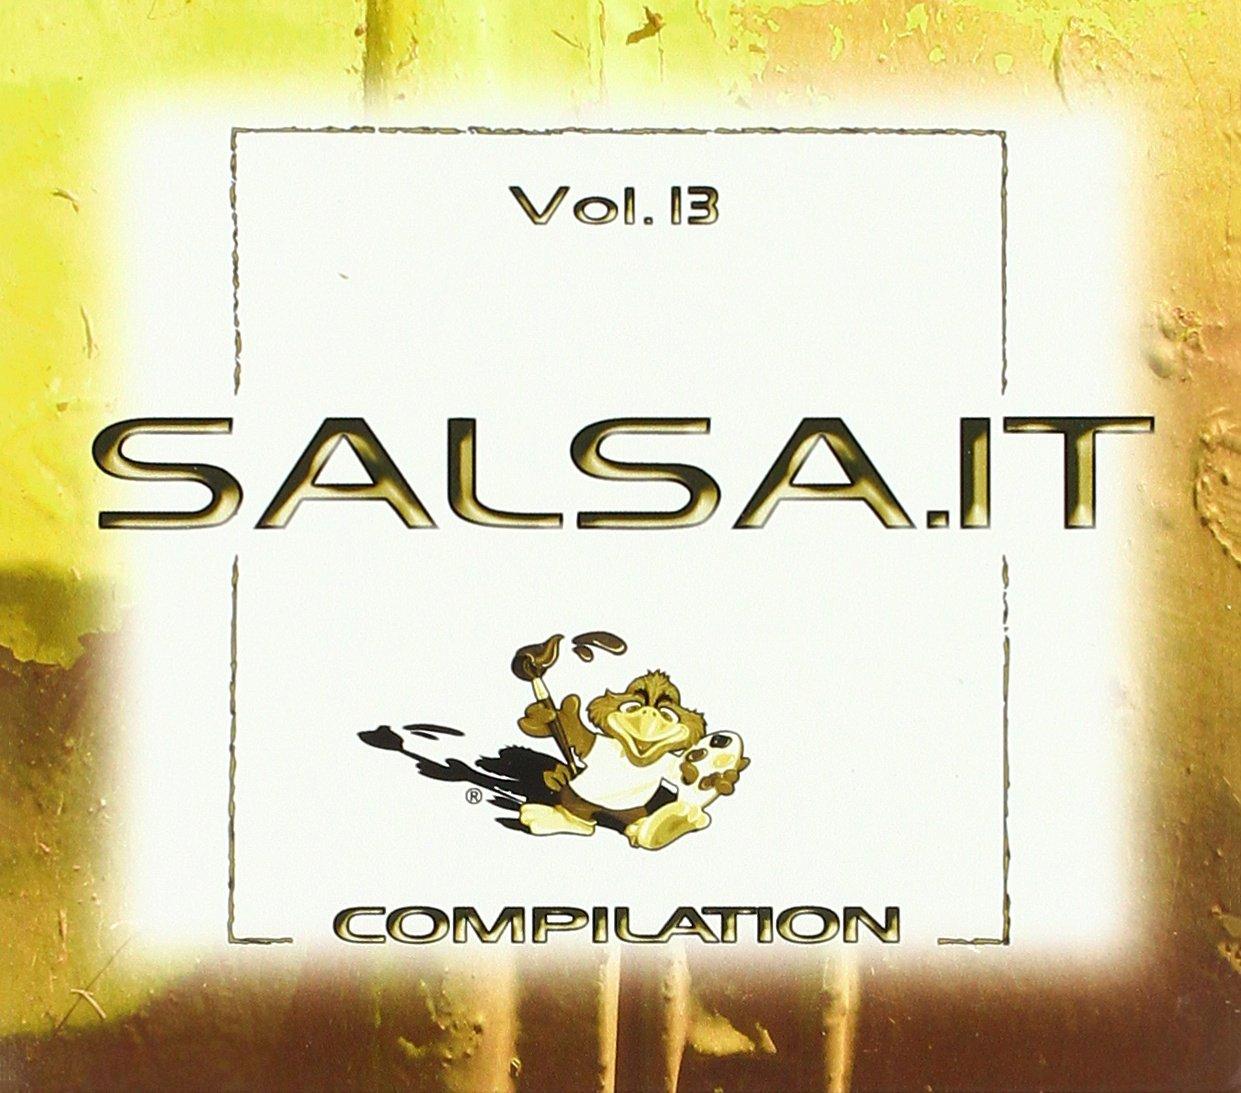 PARA TITO - SALSA.IT COMPILATION VOL.13